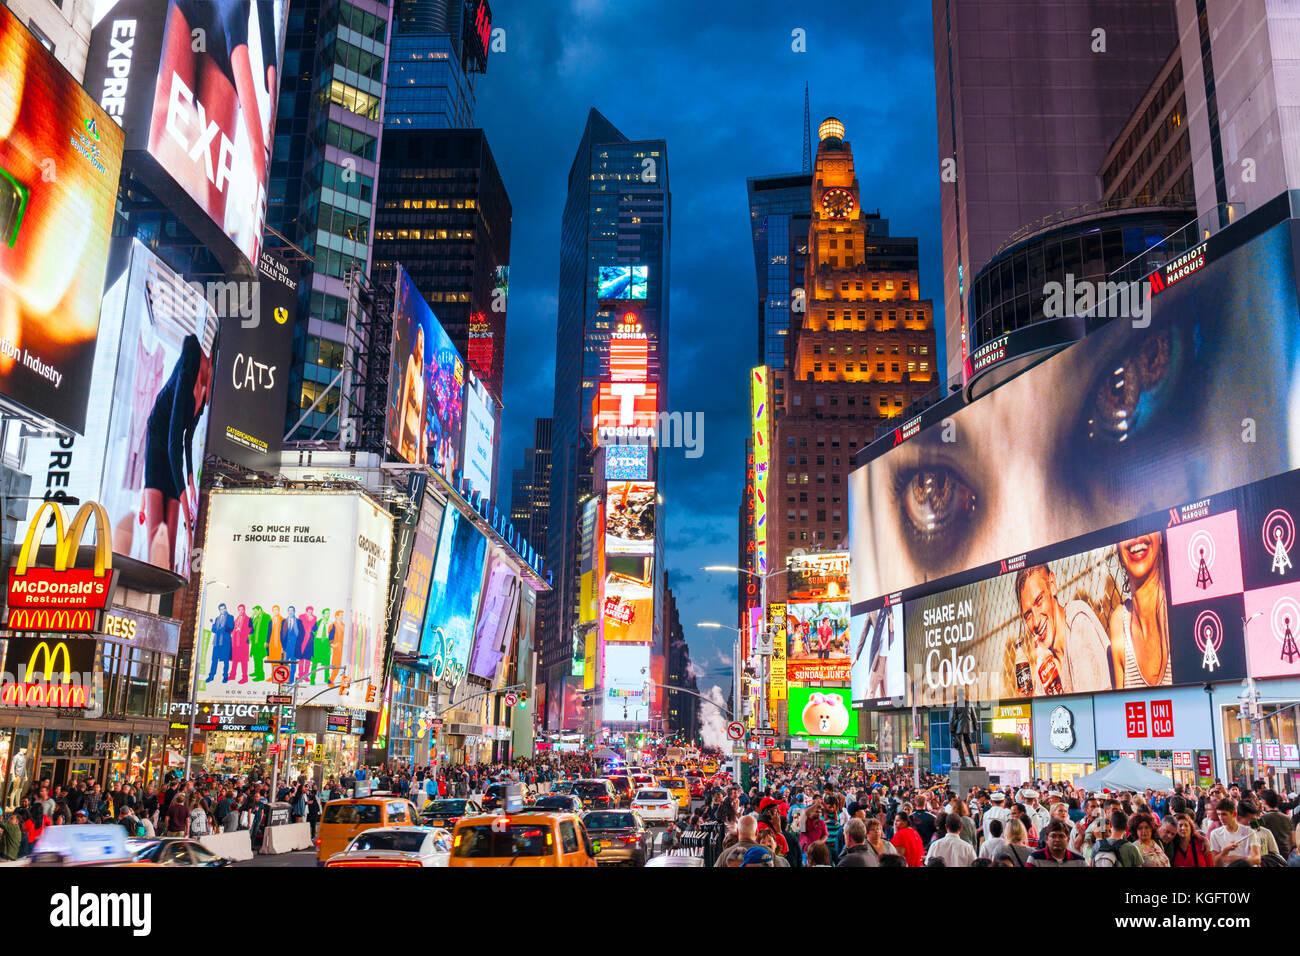 New York Stati Uniti New York Times square occupato affollate di turisti manhatten New York STATI UNITI D'america Immagini Stock